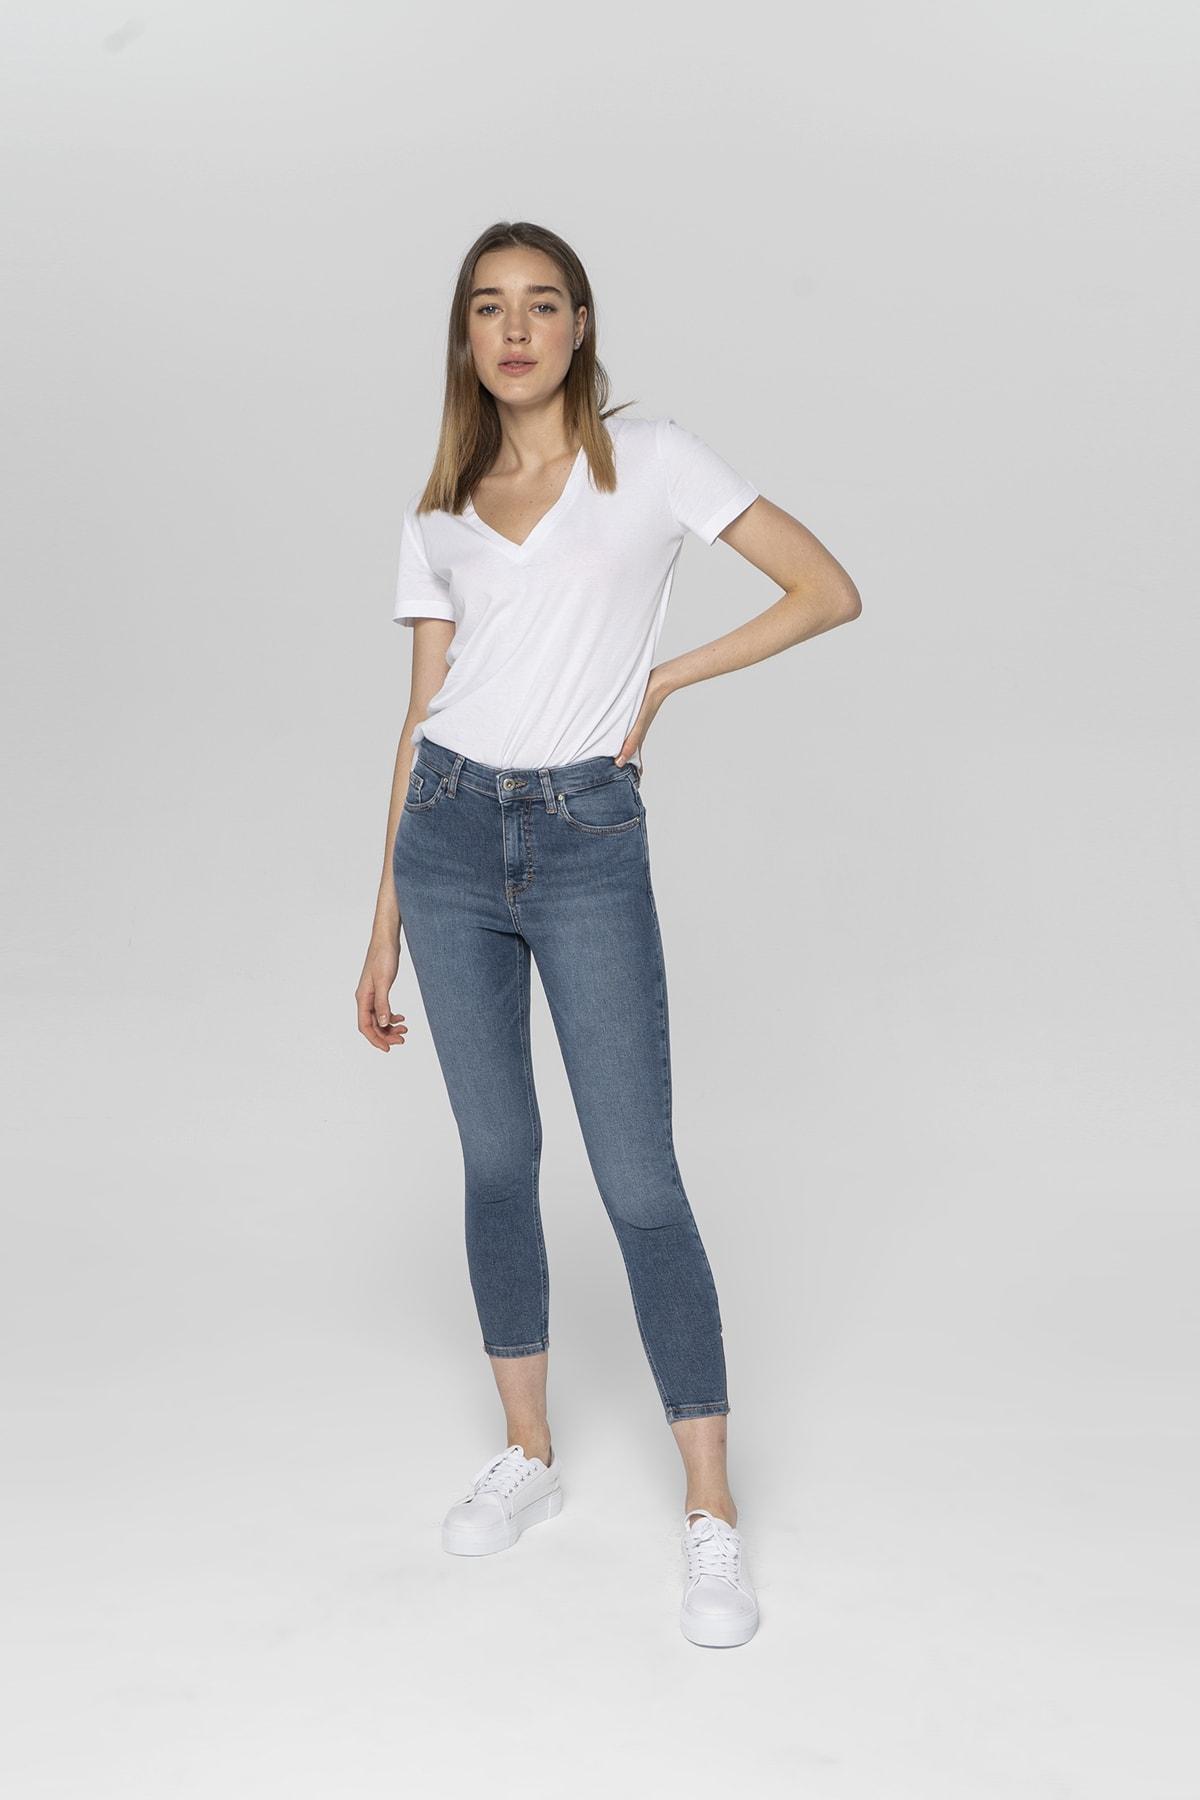 Judy Orta Mavi Yüksek Bel Paçası Fermuarlı Skinny Fit Jean Pantolon